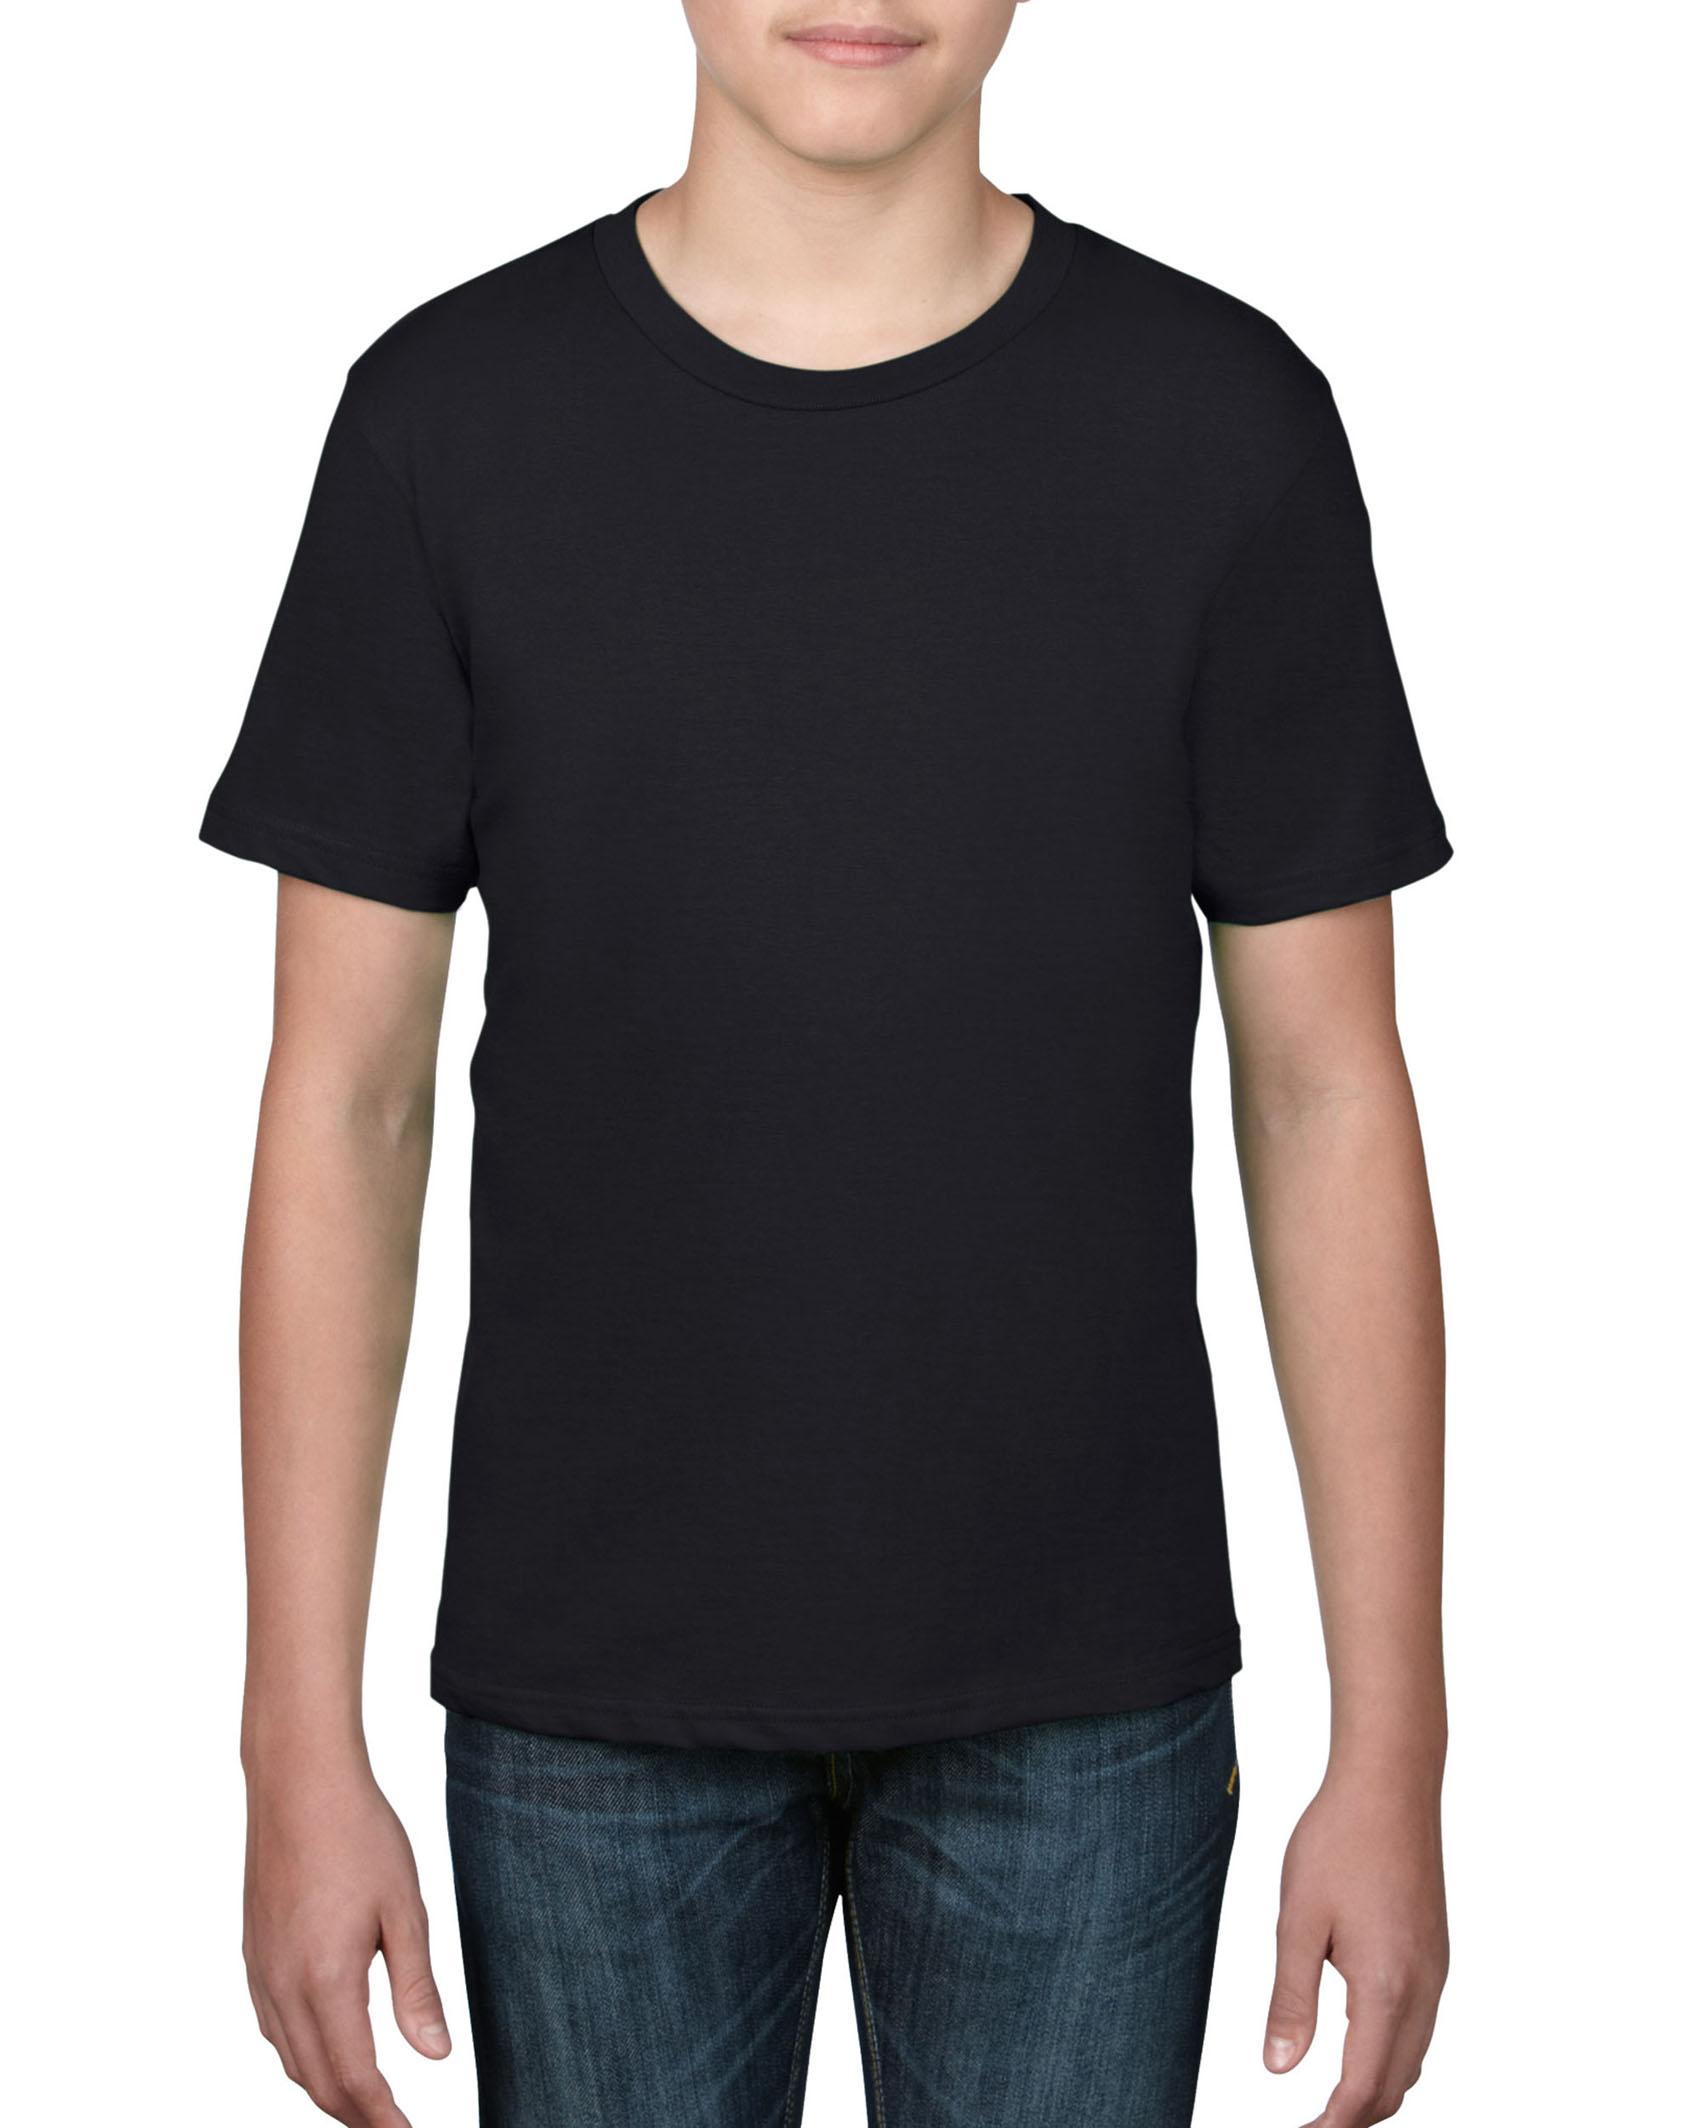 Anvil T-shirt Fashion SS for kids